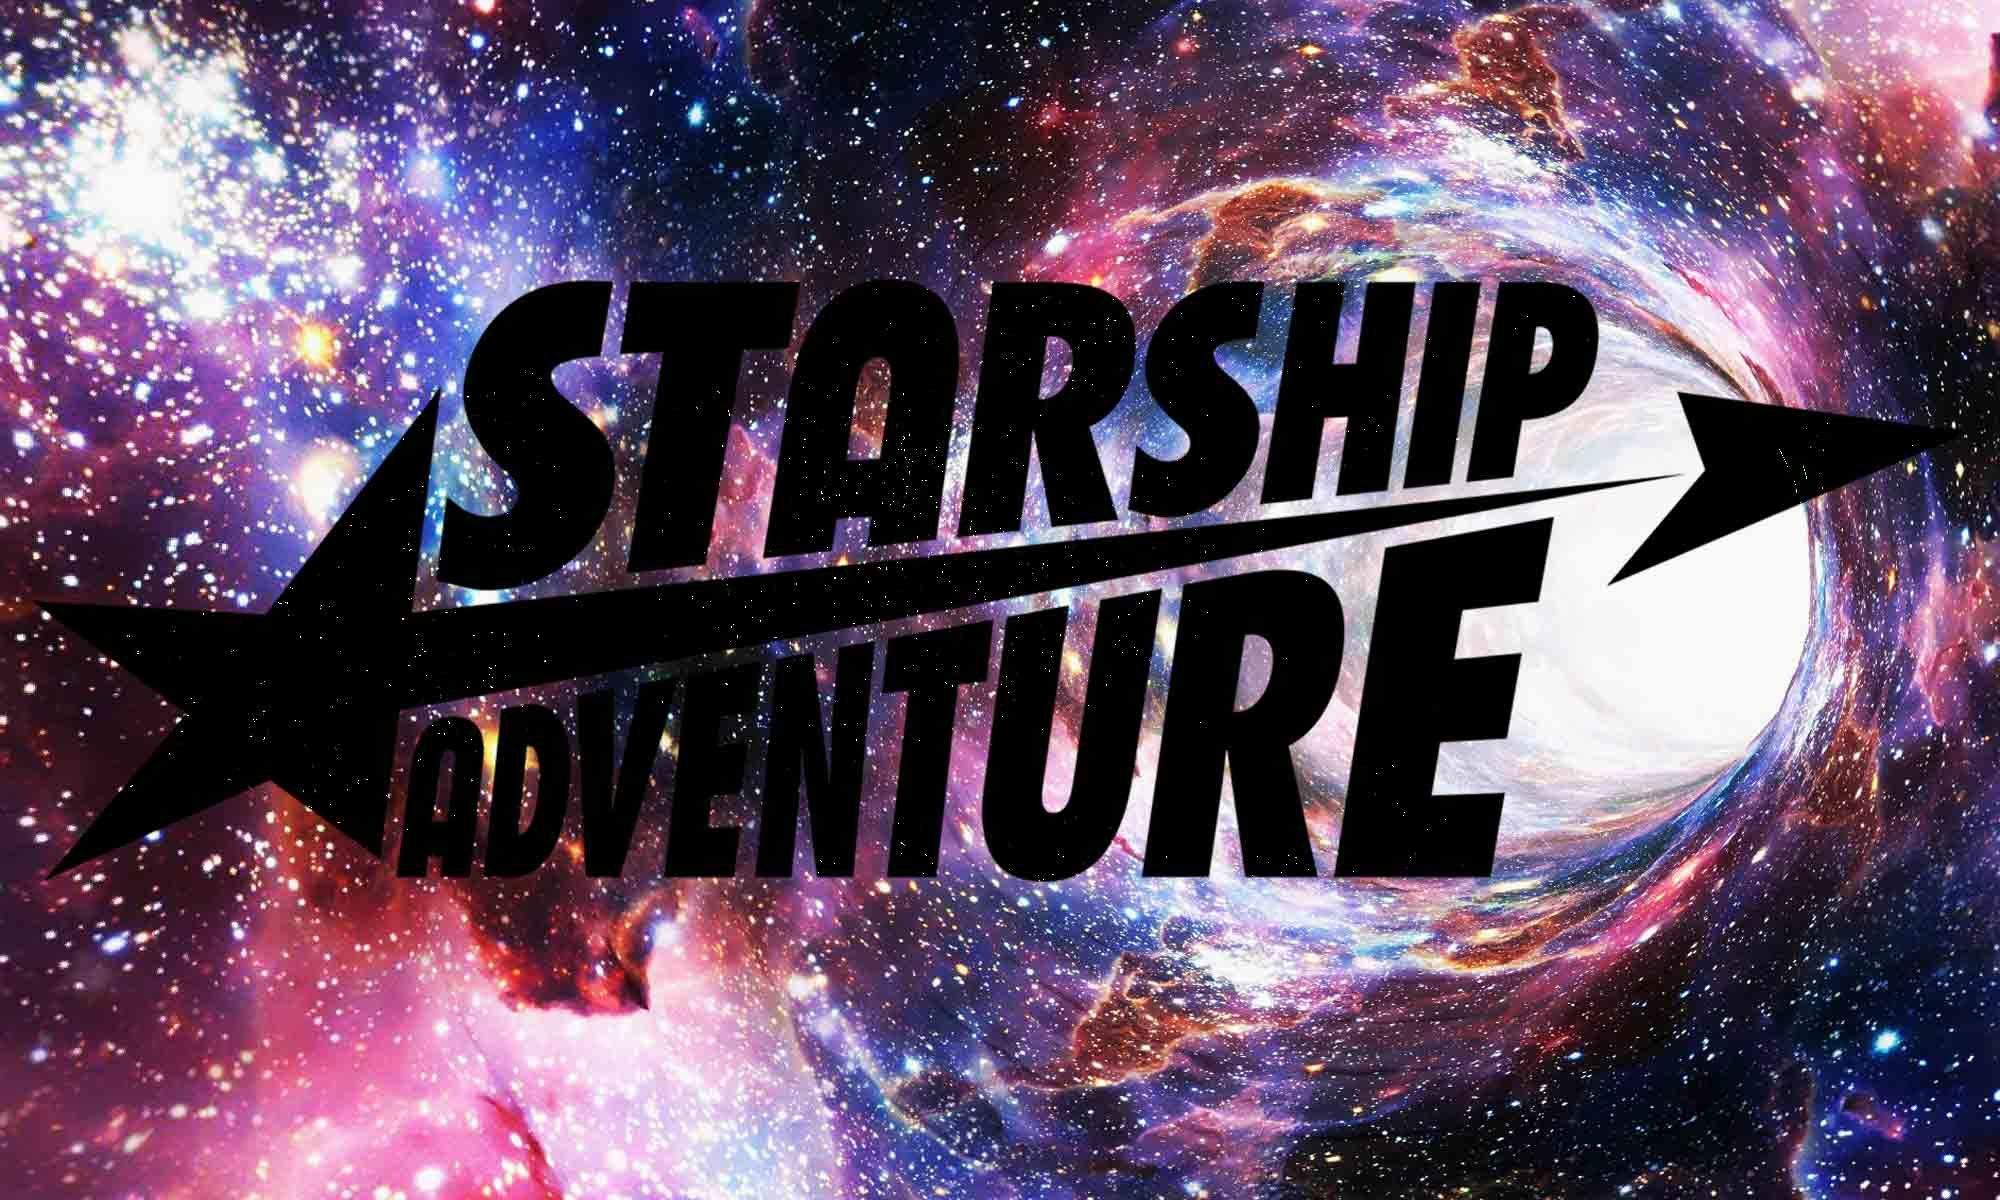 Starship Adventure